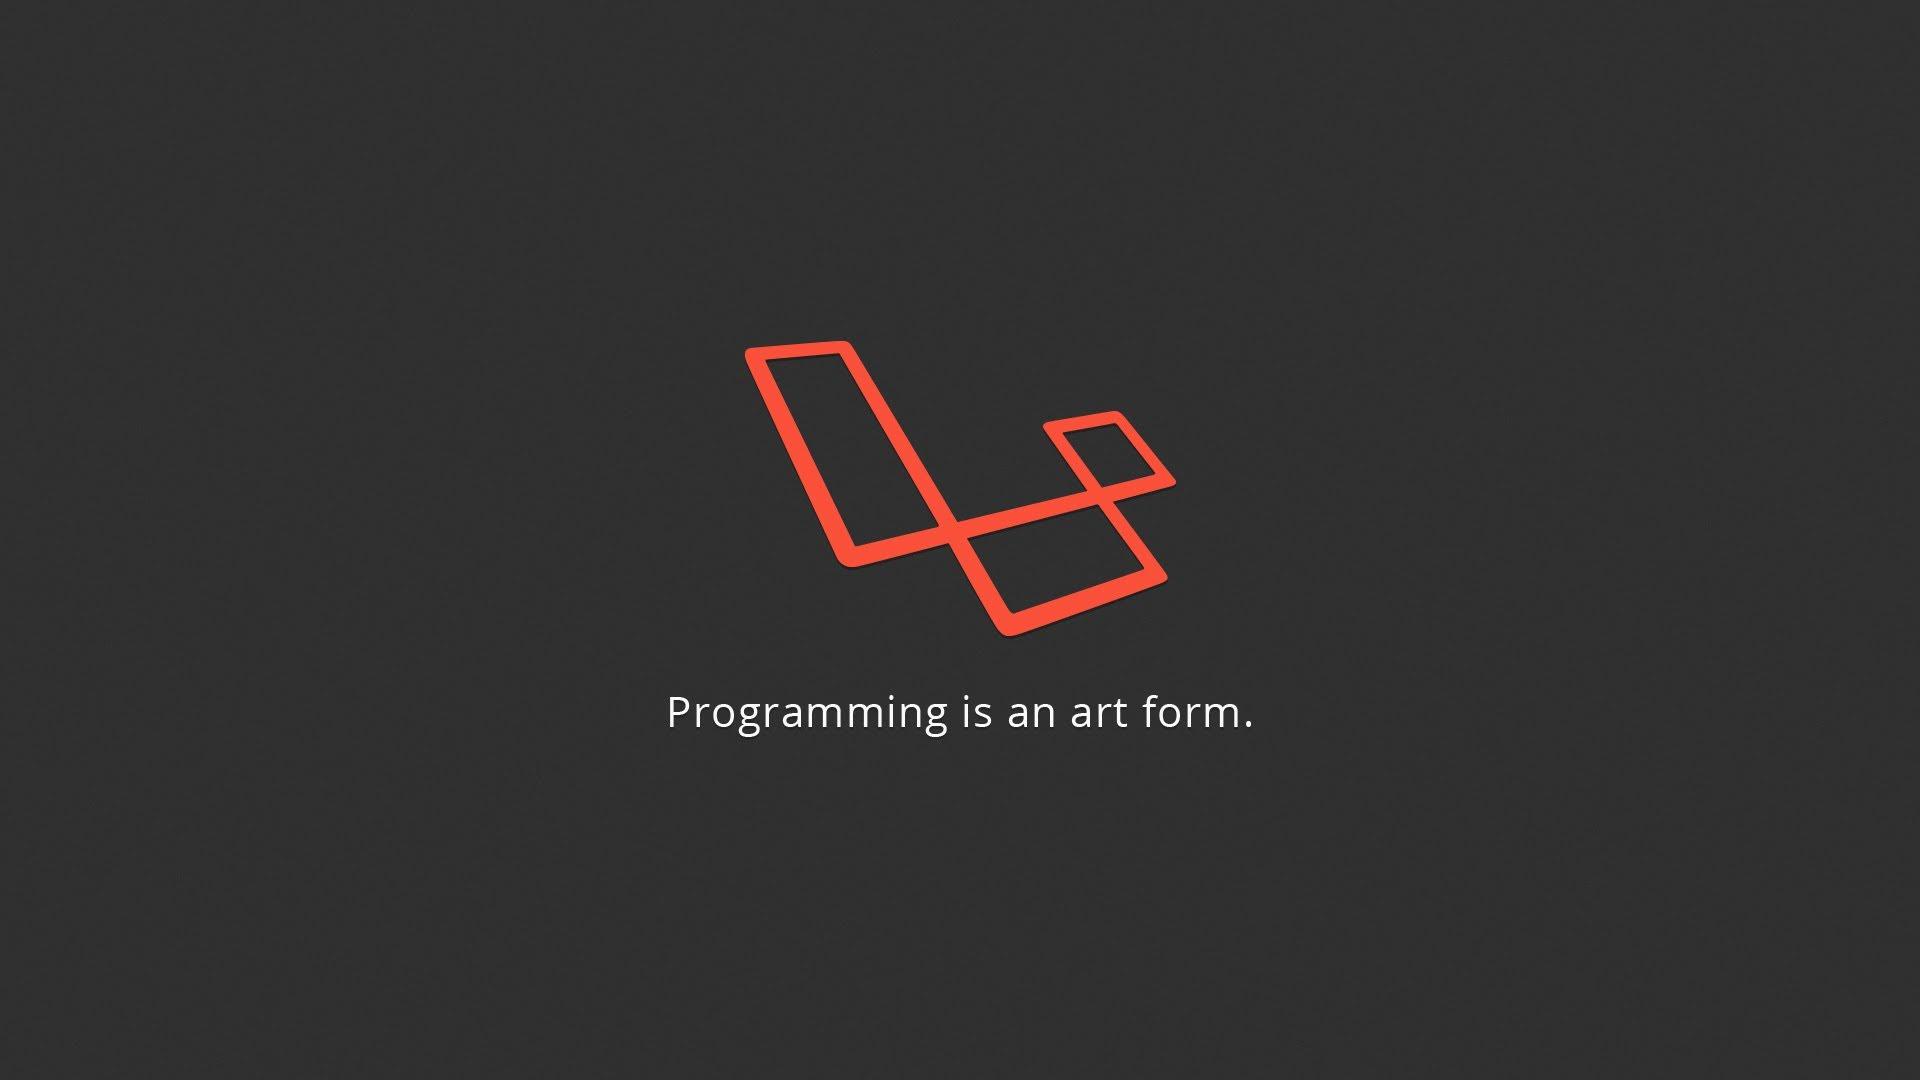 30 Programming HD Wallpapers for Desktop 1920x1080